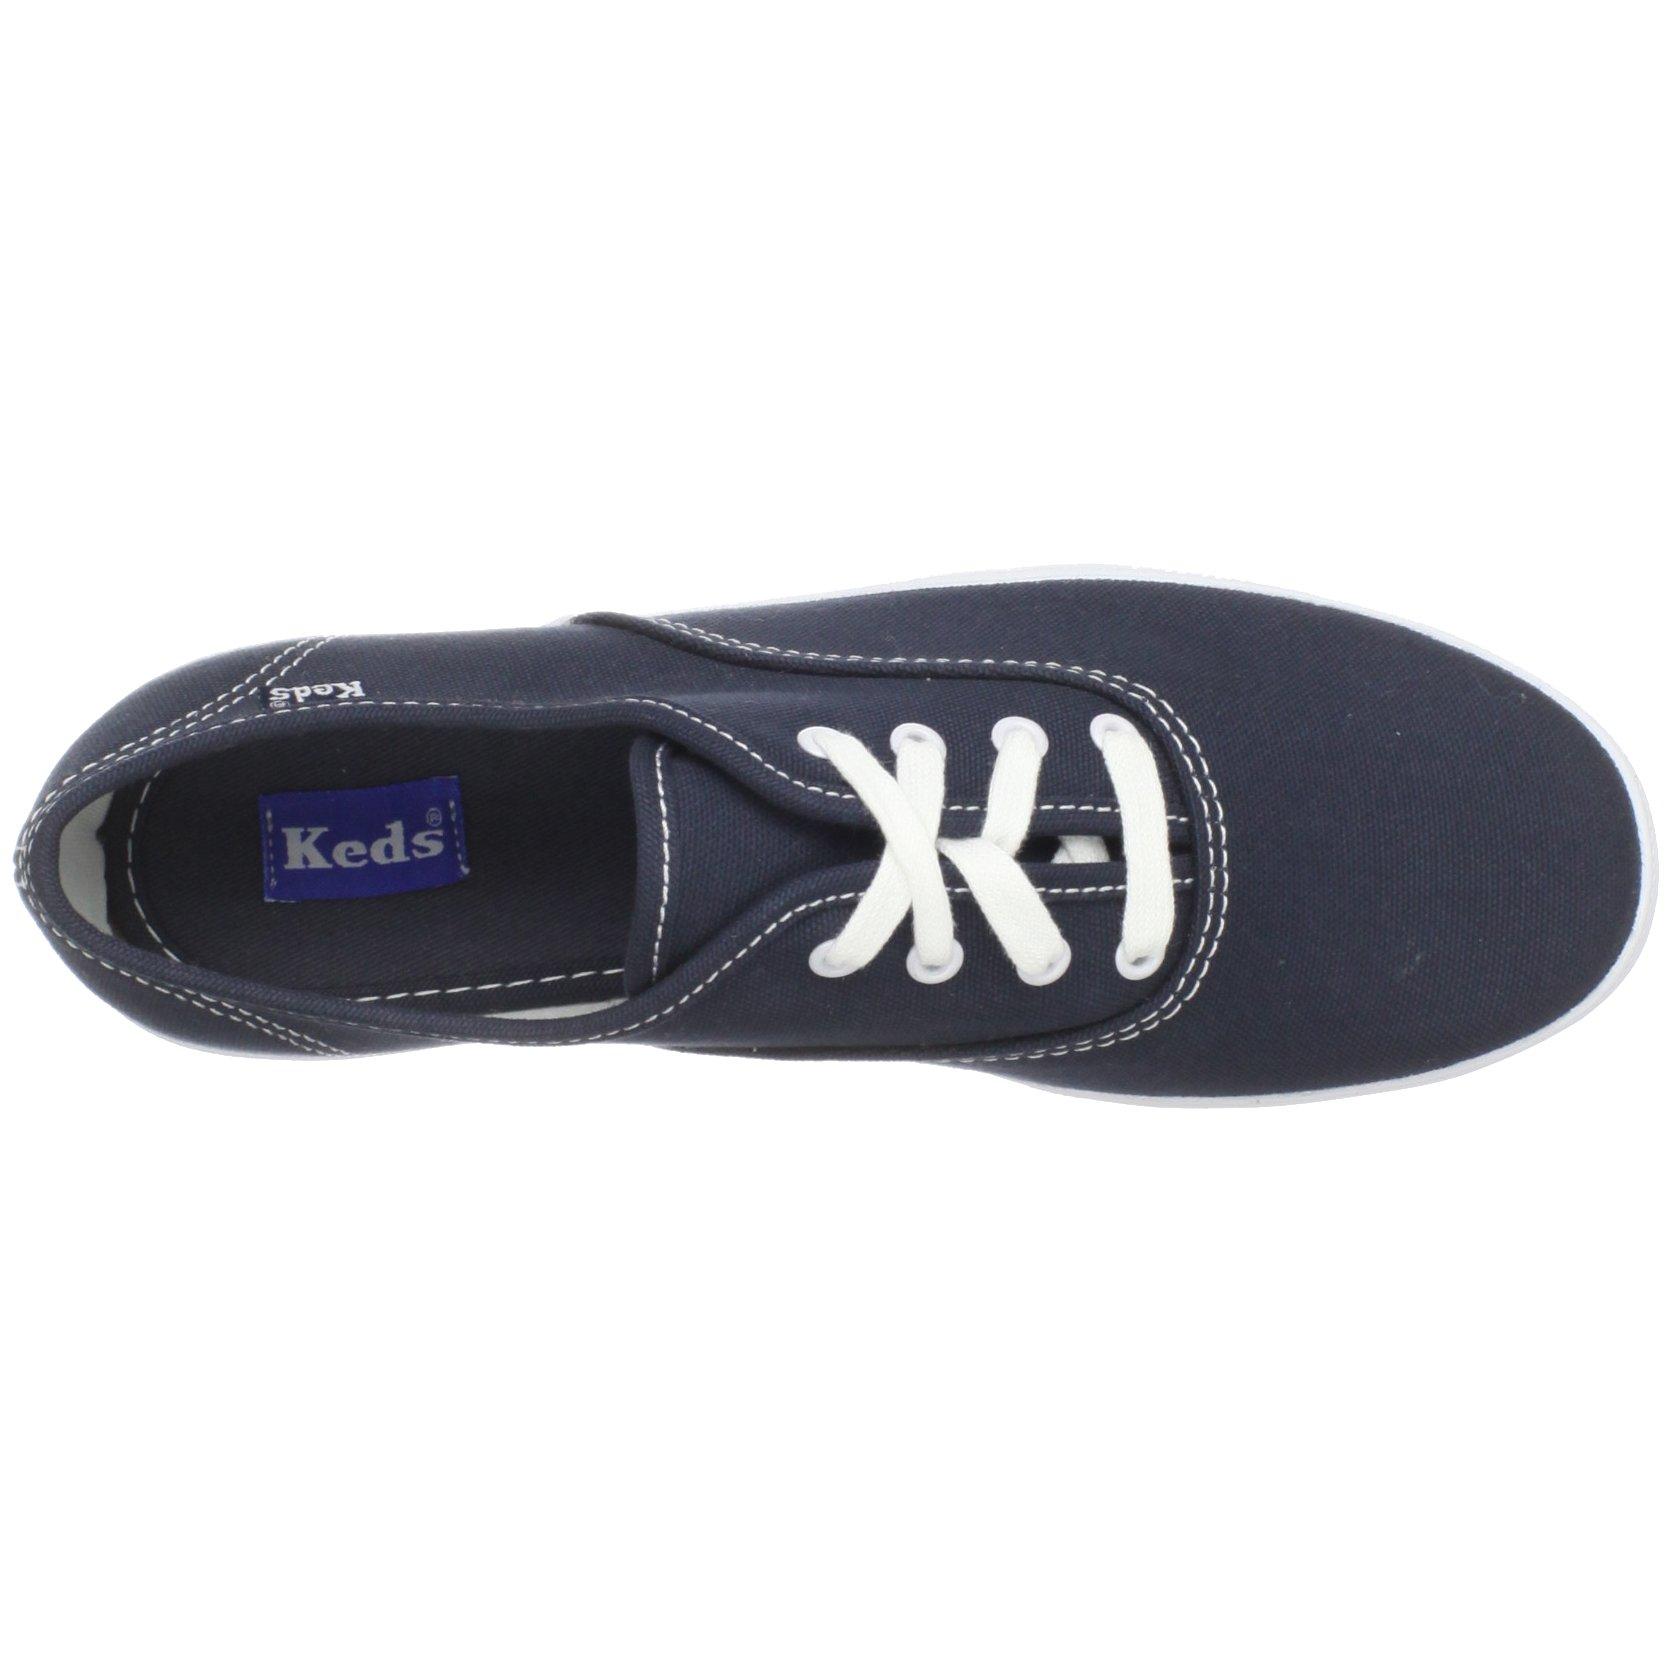 Keds Original Champion CVO Sneaker (Toddler/Little Kid/Big Kid),Navy/White,13.5 M US Little Kid by Keds (Image #7)